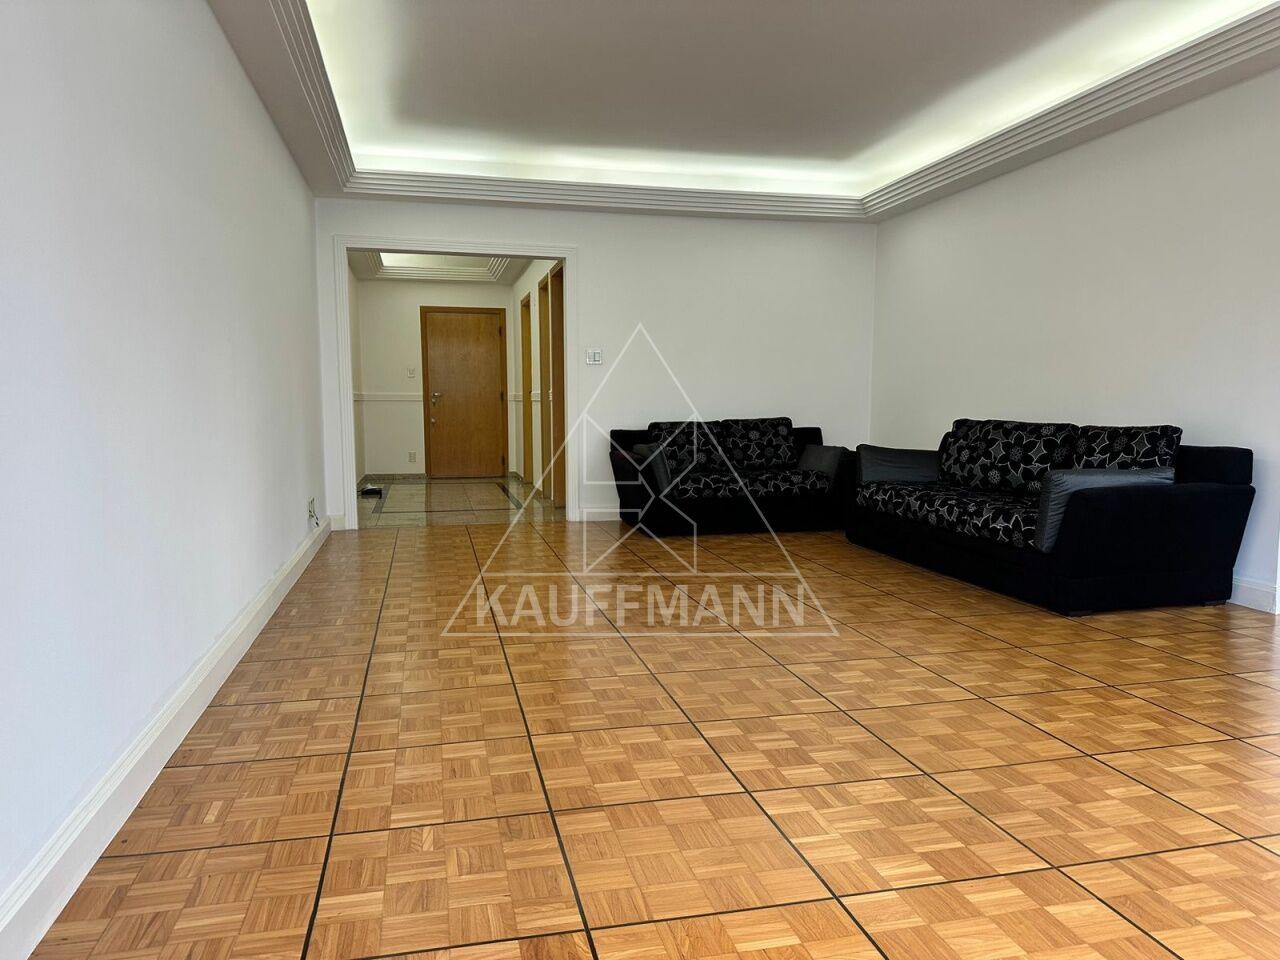 apartamento-venda-sao-paulo-higienopolis-inaja-3dormitorios-1suite-1vaga-212m2-Foto2